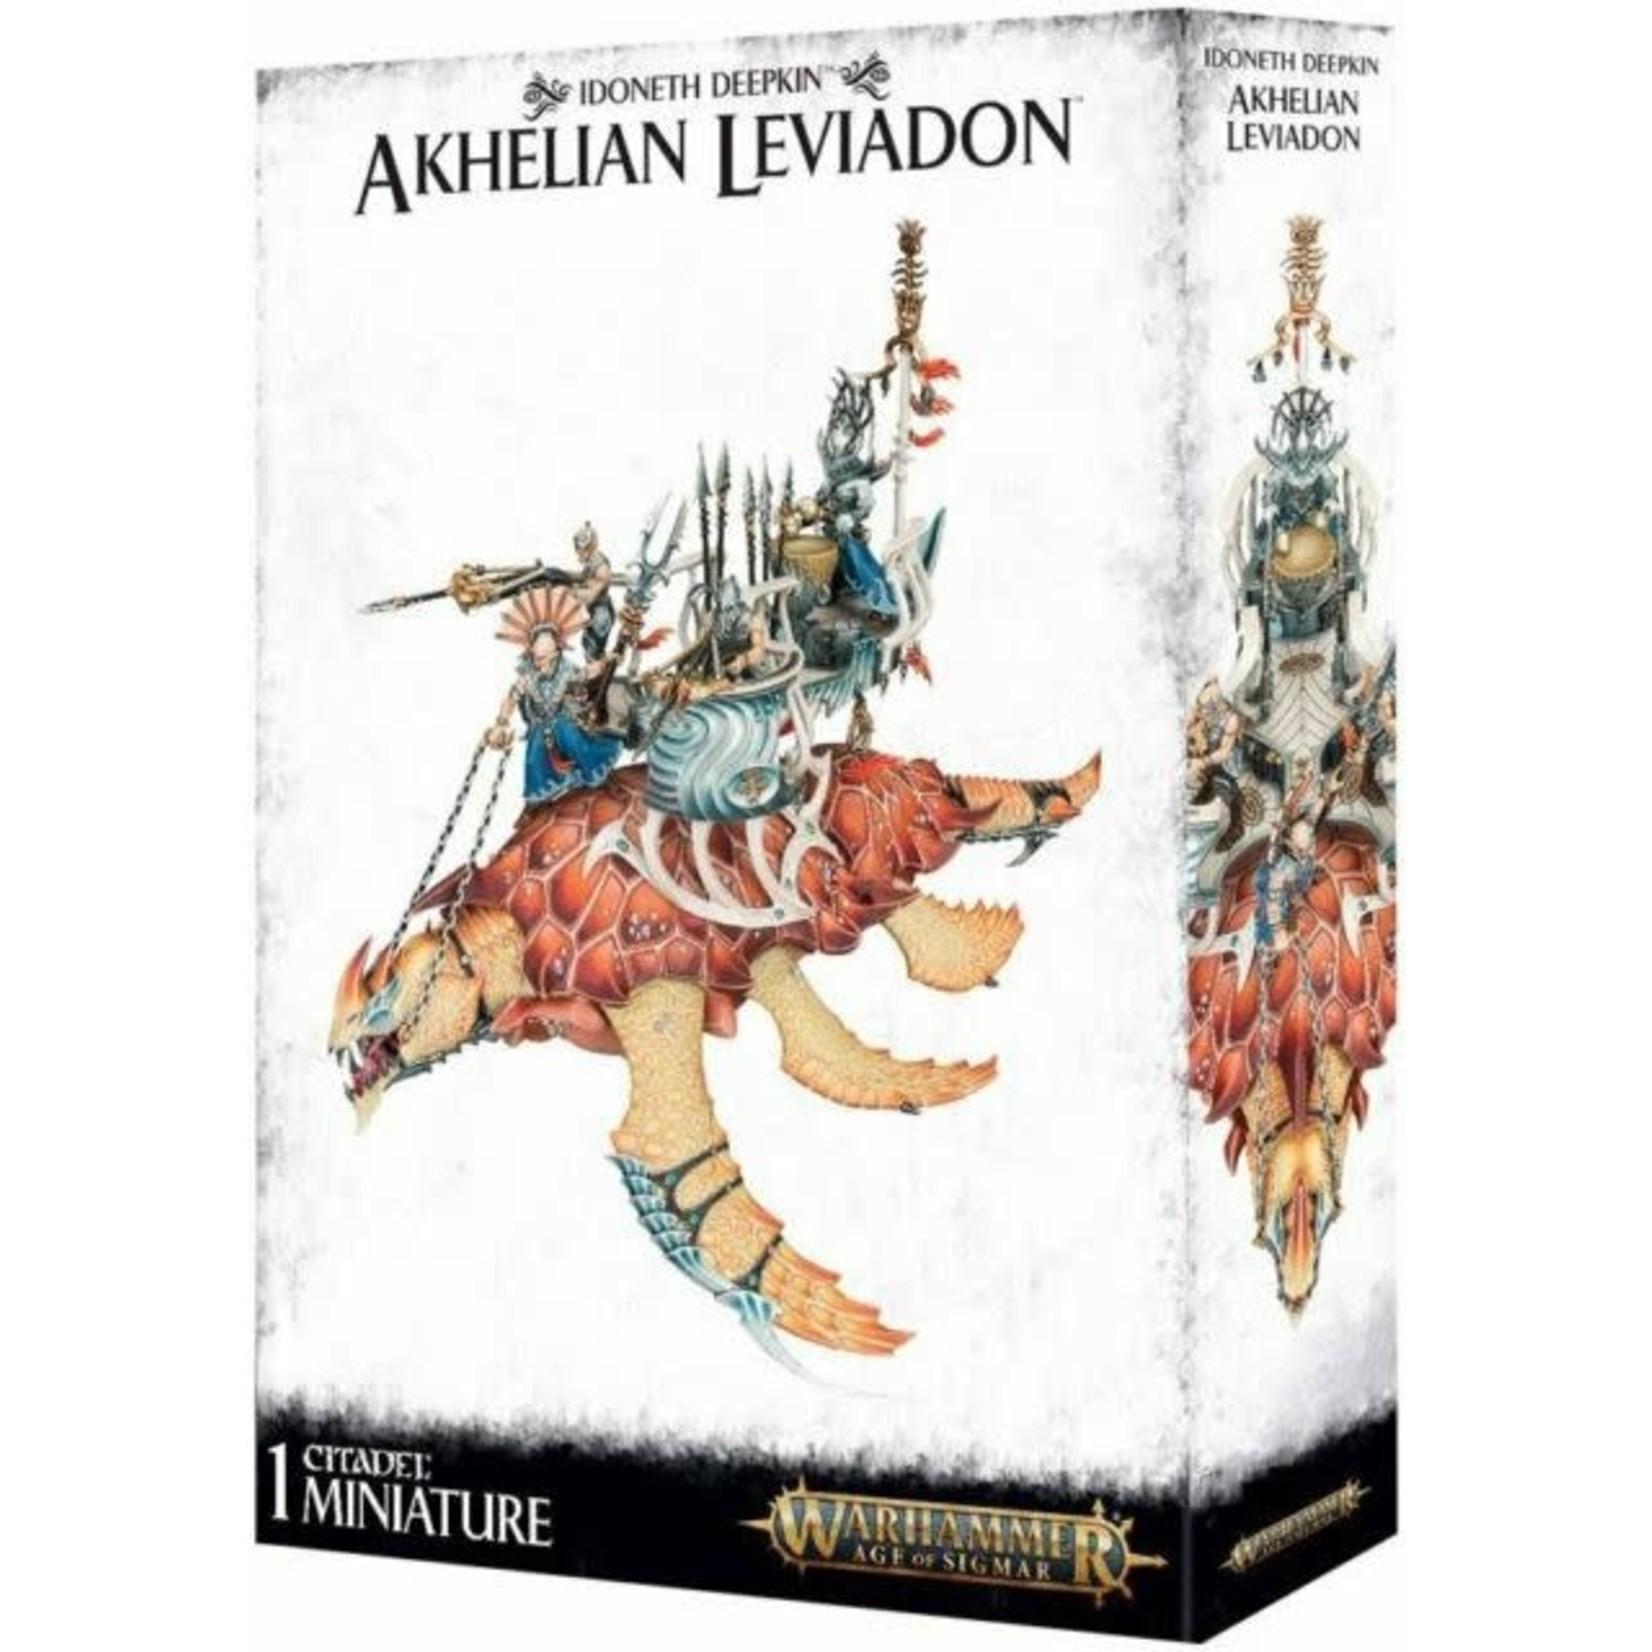 Idoneth Deepkin Akhelian Leviadon (AOS)